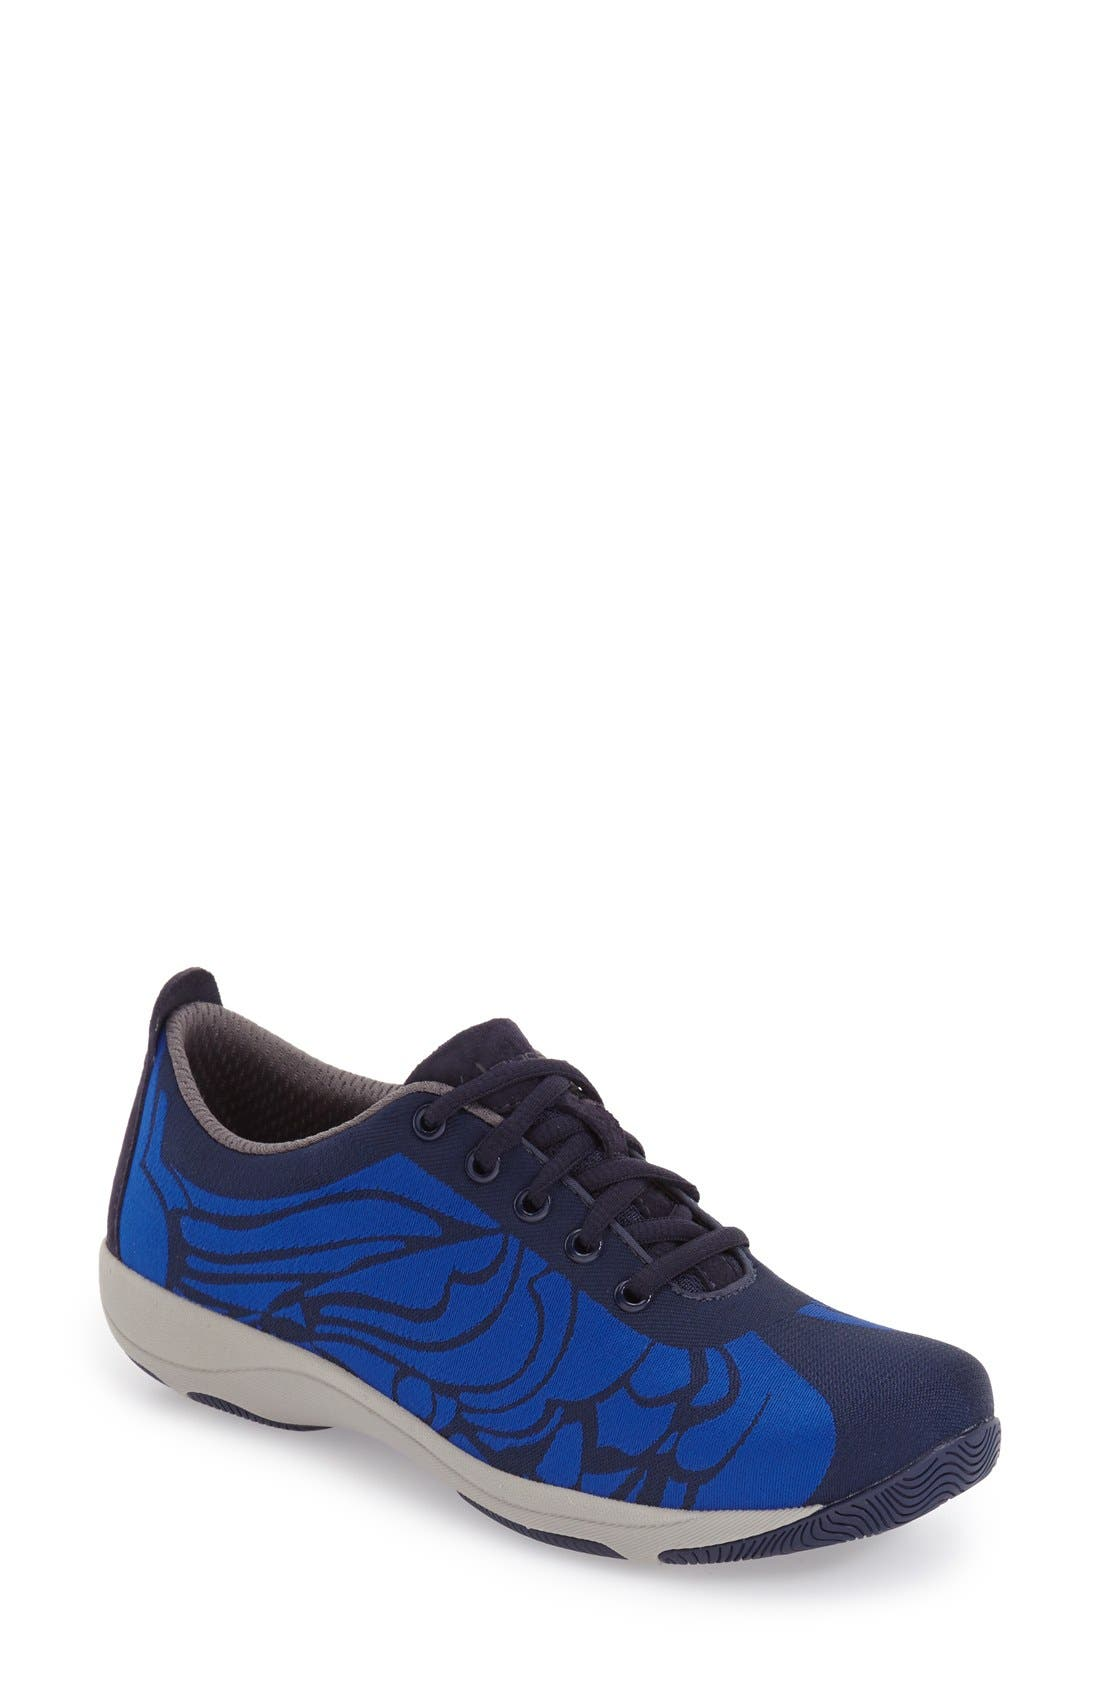 Alternate Image 1 Selected - Dansko 'Hanna' Sneaker (Women)